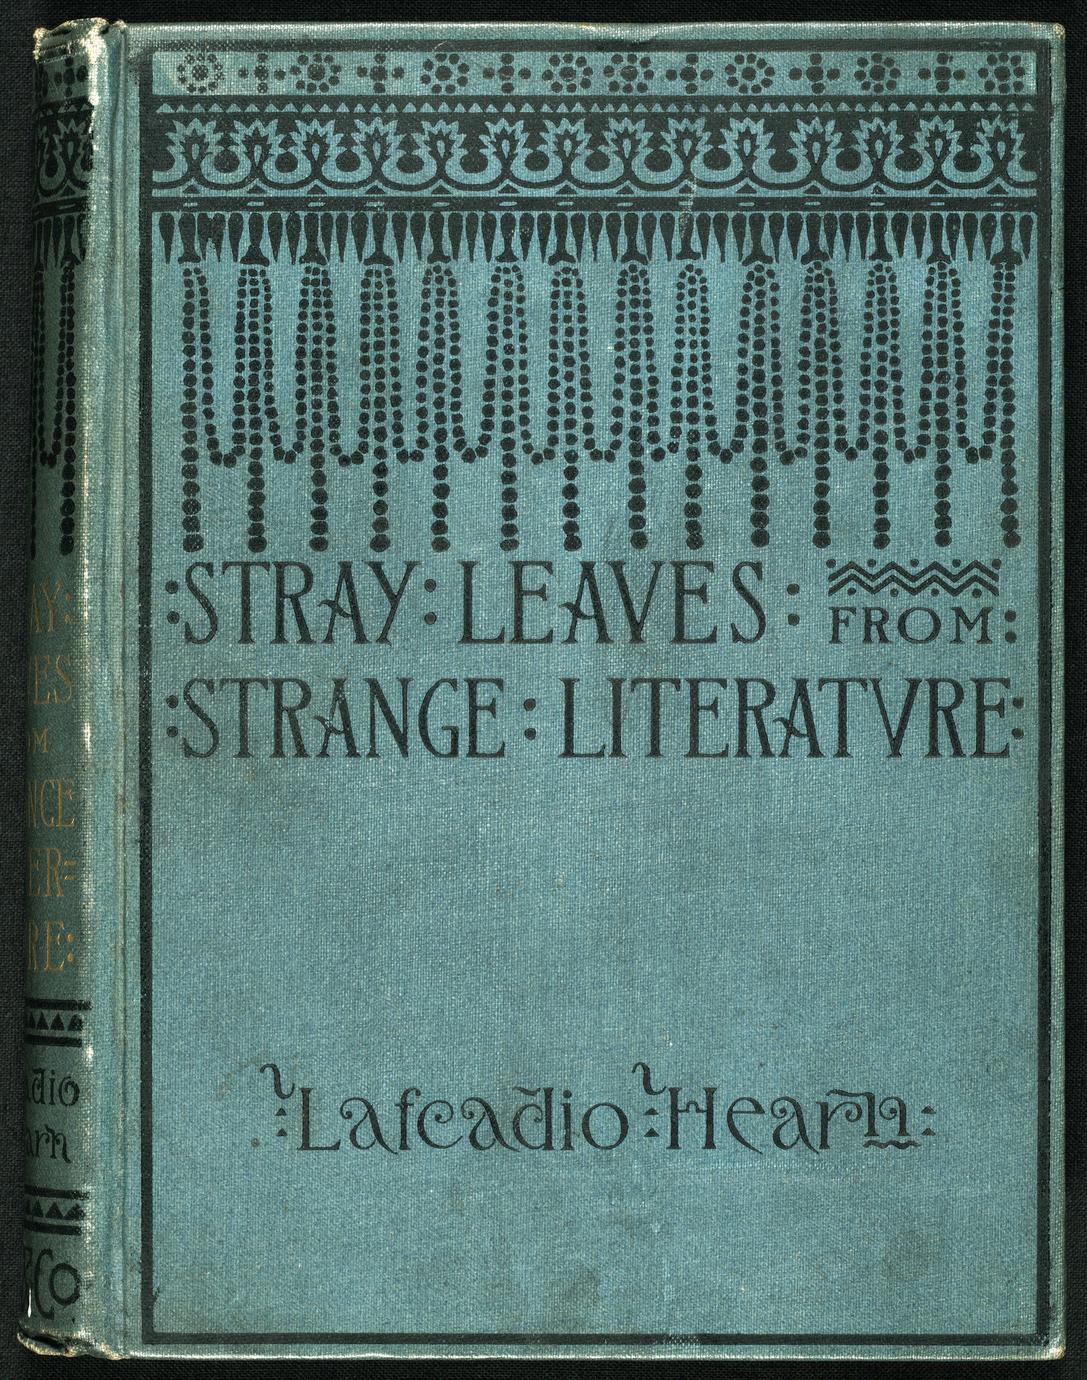 Stray leaves from strange literature : stories reconstructed from the Anvari-Soheïli, Baitál, Pachísí,  Mahabharata, Pantchatantra, Gulistan, Talmud, Kalewala, etc. (1 of 2)